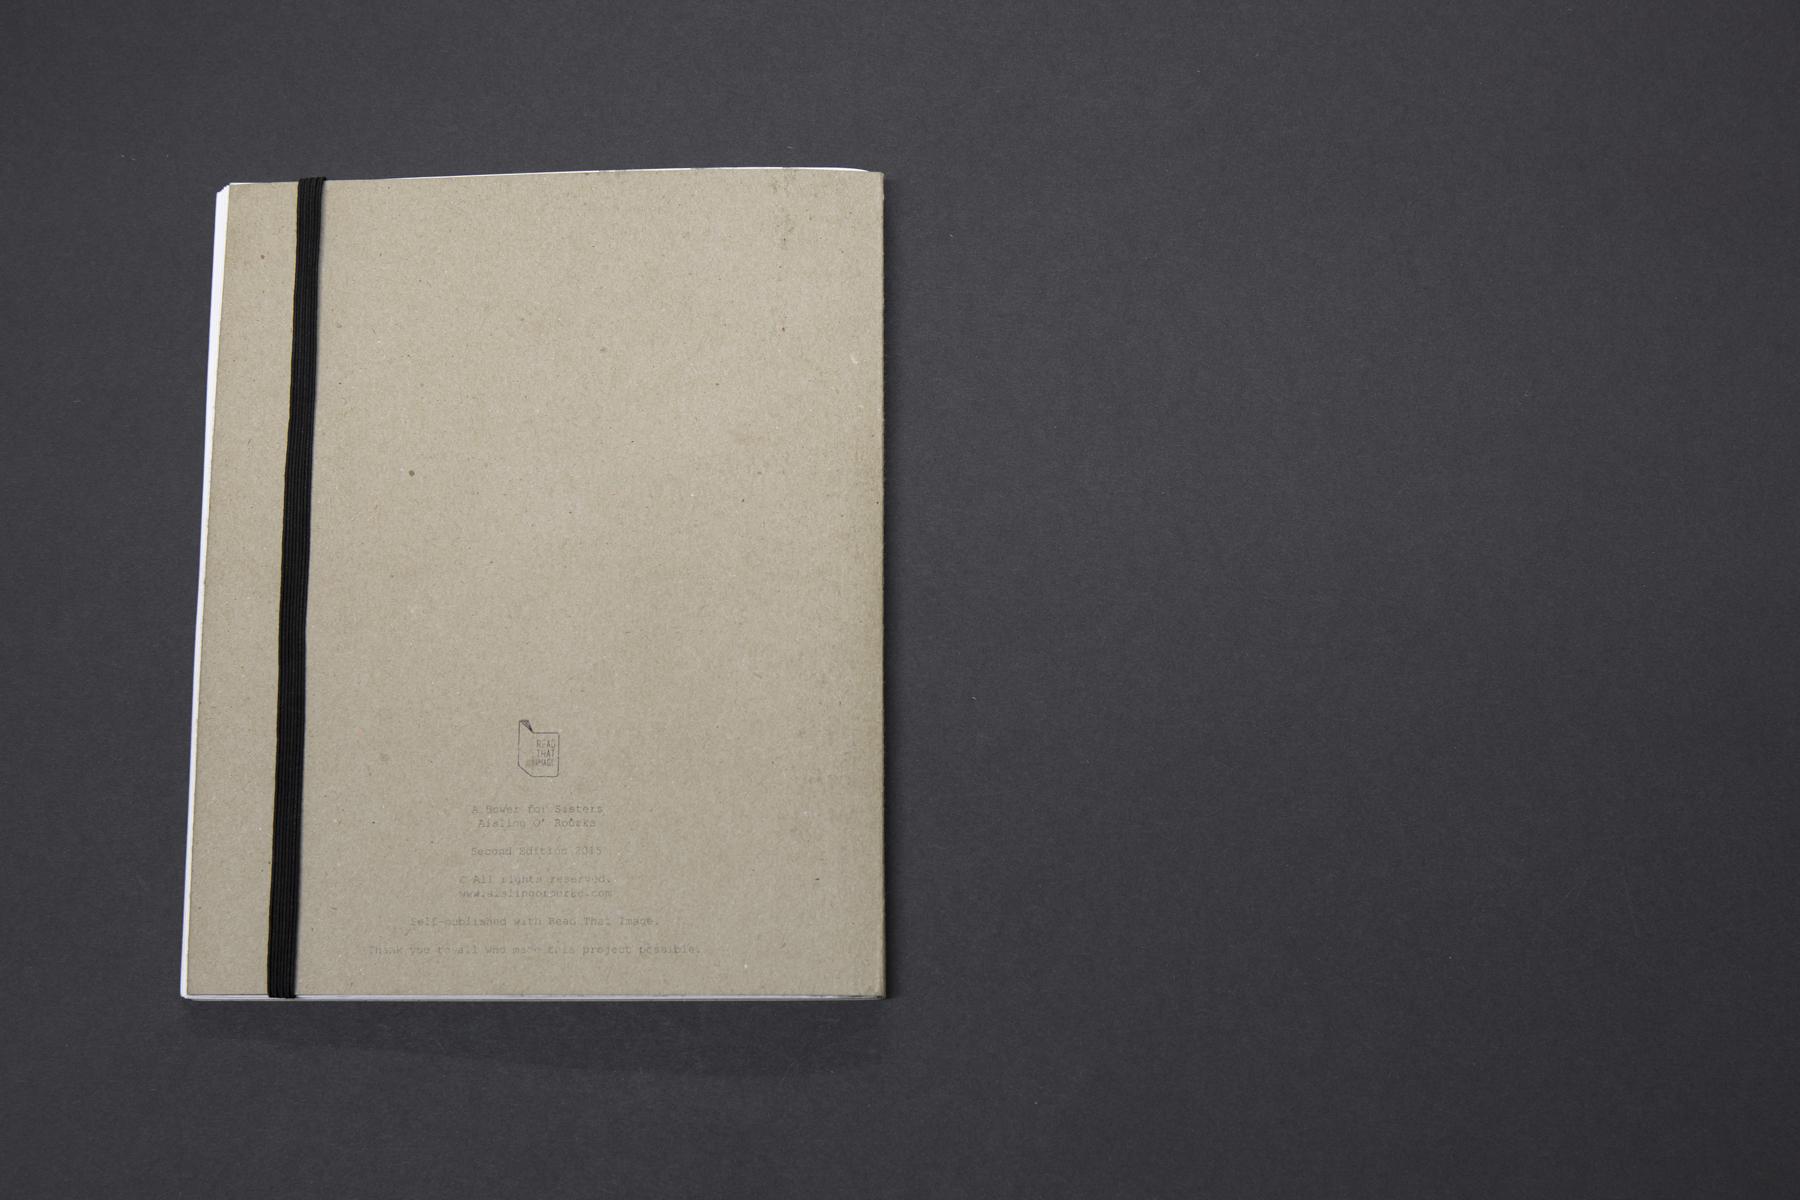 abowerforsisters-book-28.jpg